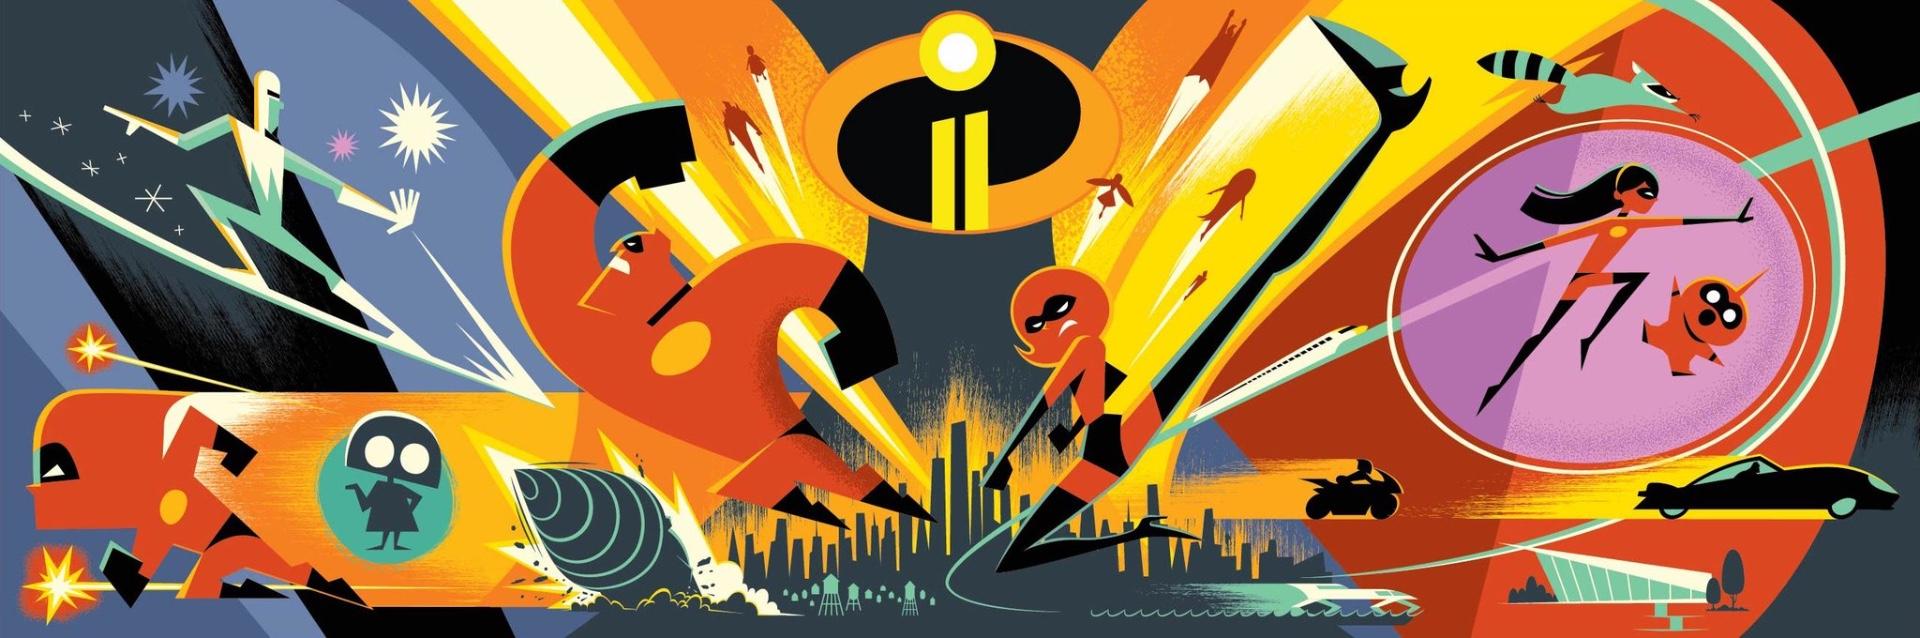 The-Incredibles-2-Concept-Artwork.jpeg